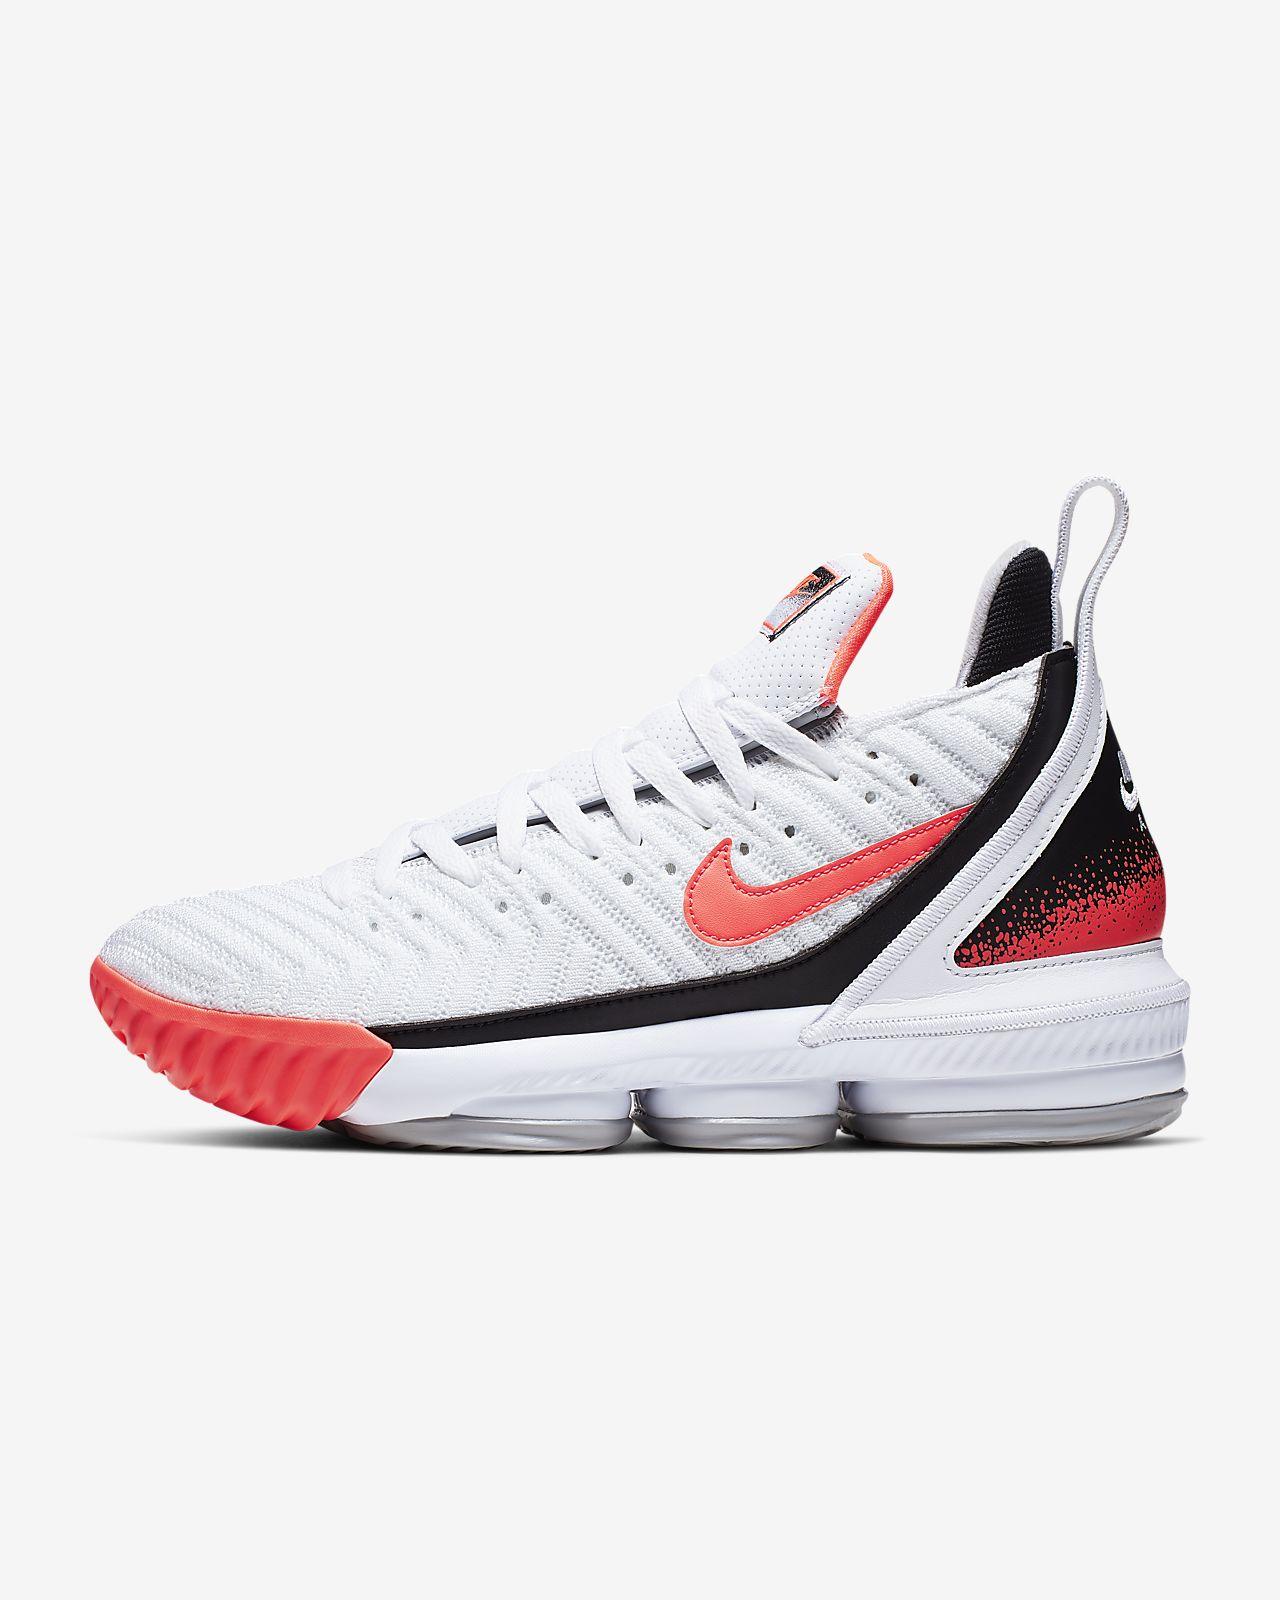 LeBron XVI Hot Lava White Basketball Shoe